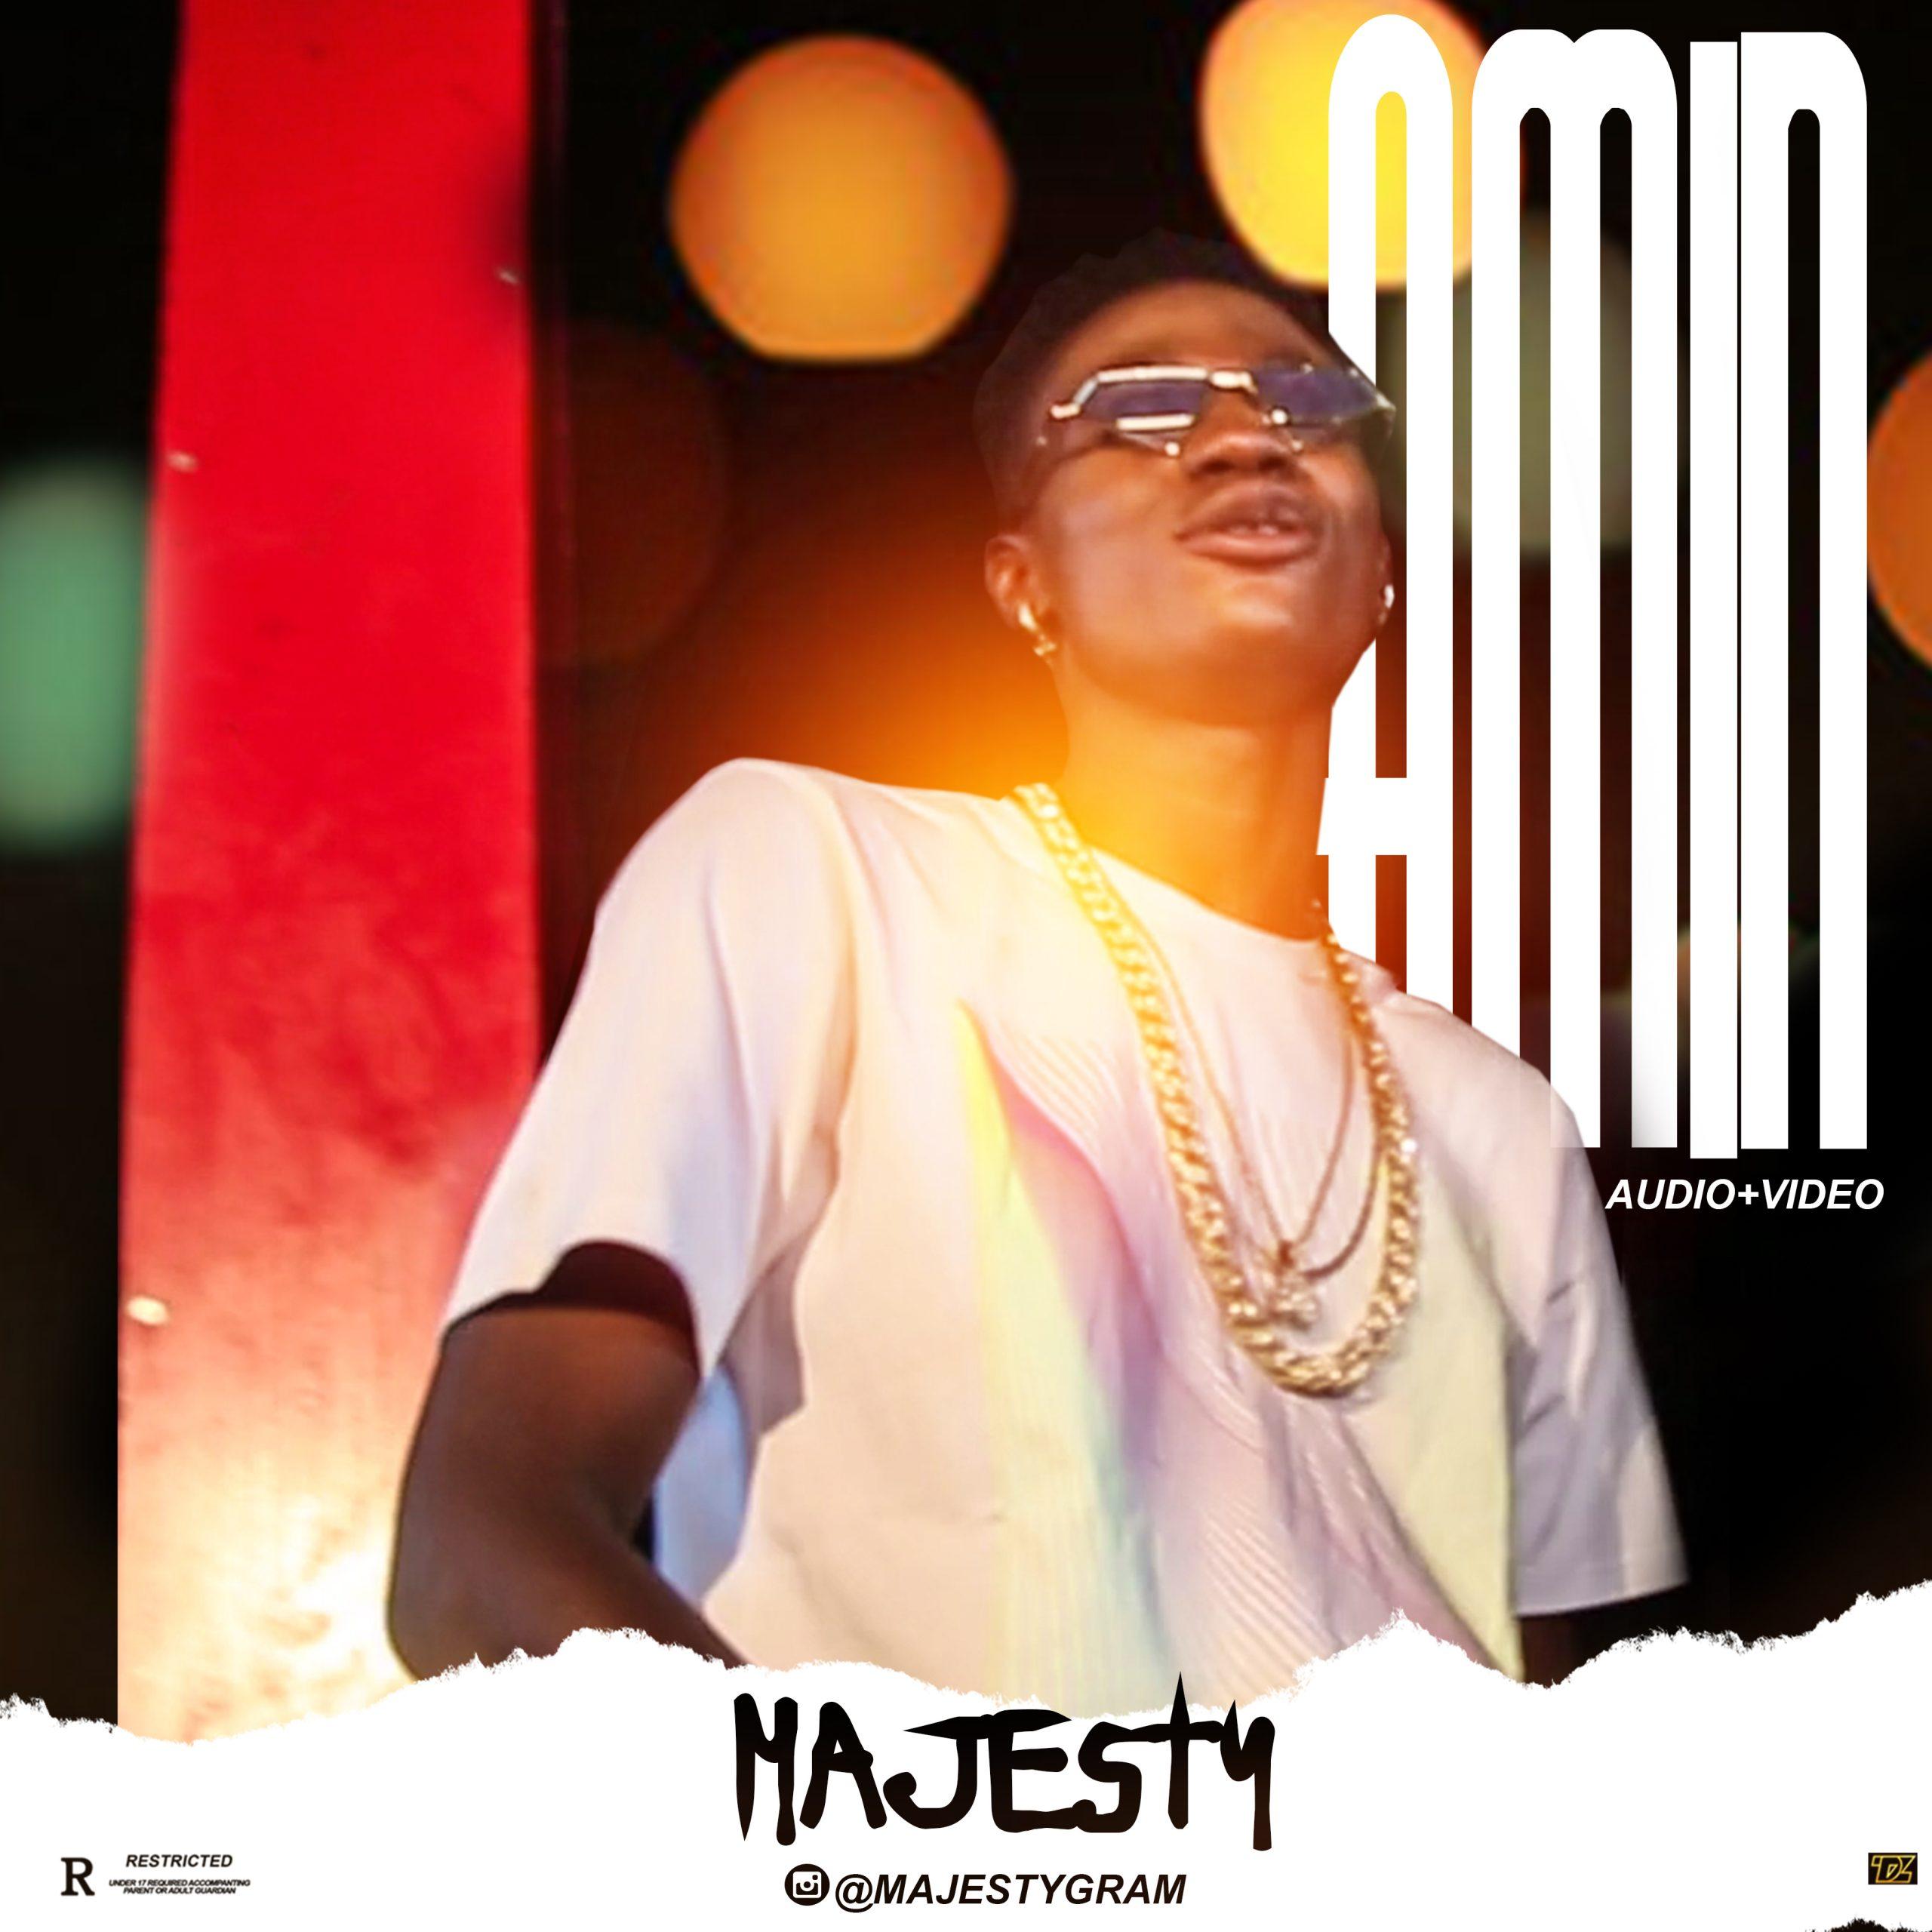 (Audio+Video) Majesty_Amin 1 138